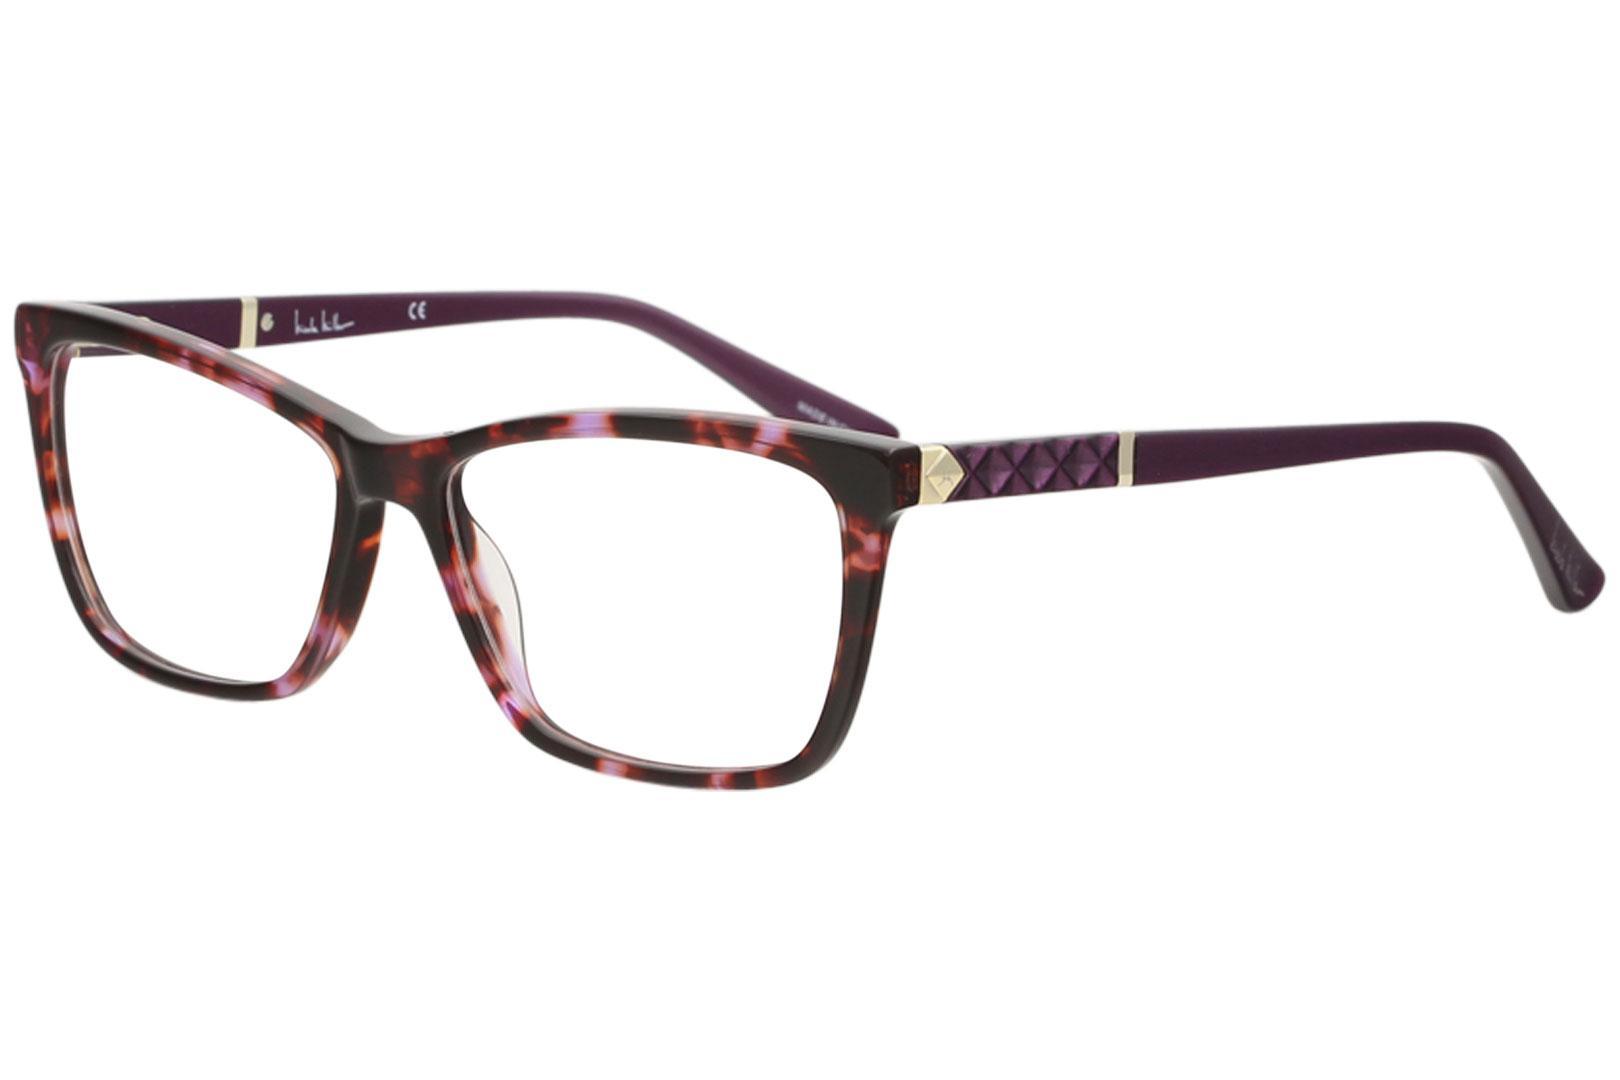 f823d01191 Nicole Miller Women s Eyeglasses NMBateau by Nicole Miller